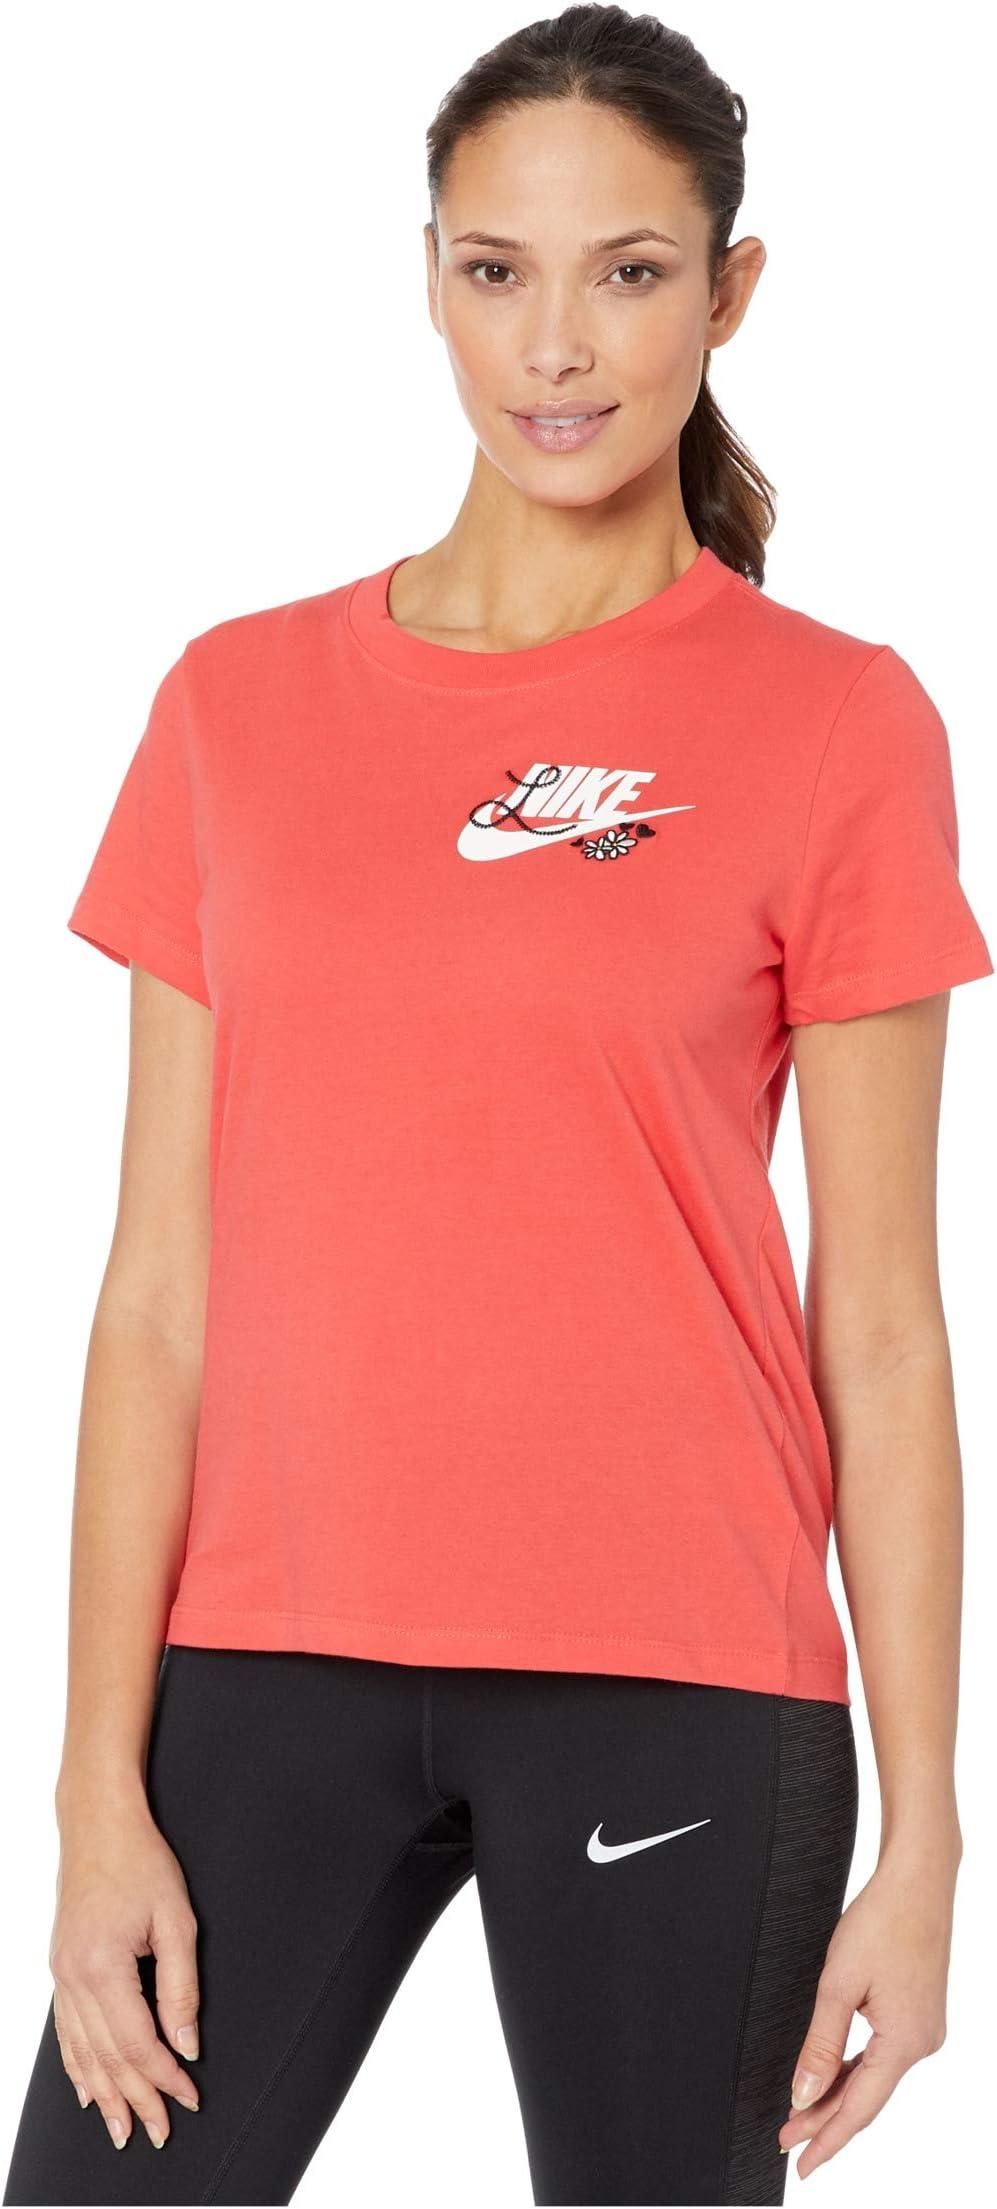 Nike Women's Clothing